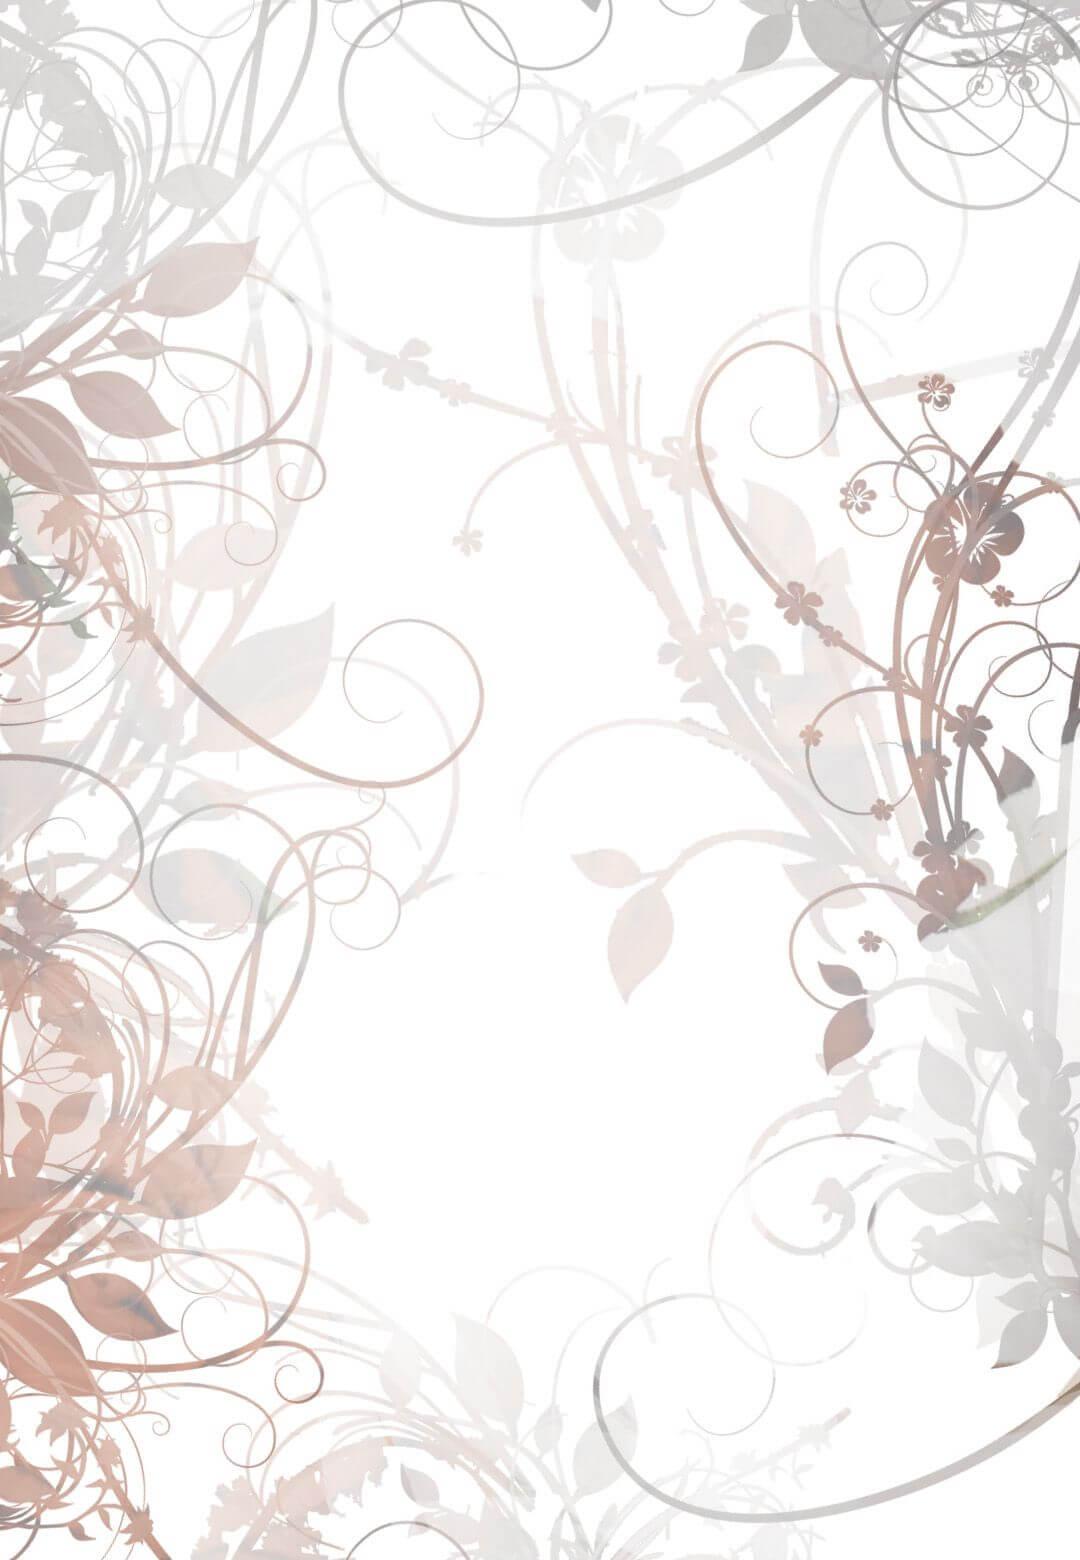 Free Printable Floral Bridal Shower Invitation | Blank Throughout Blank Bridal Shower Invitations Templates